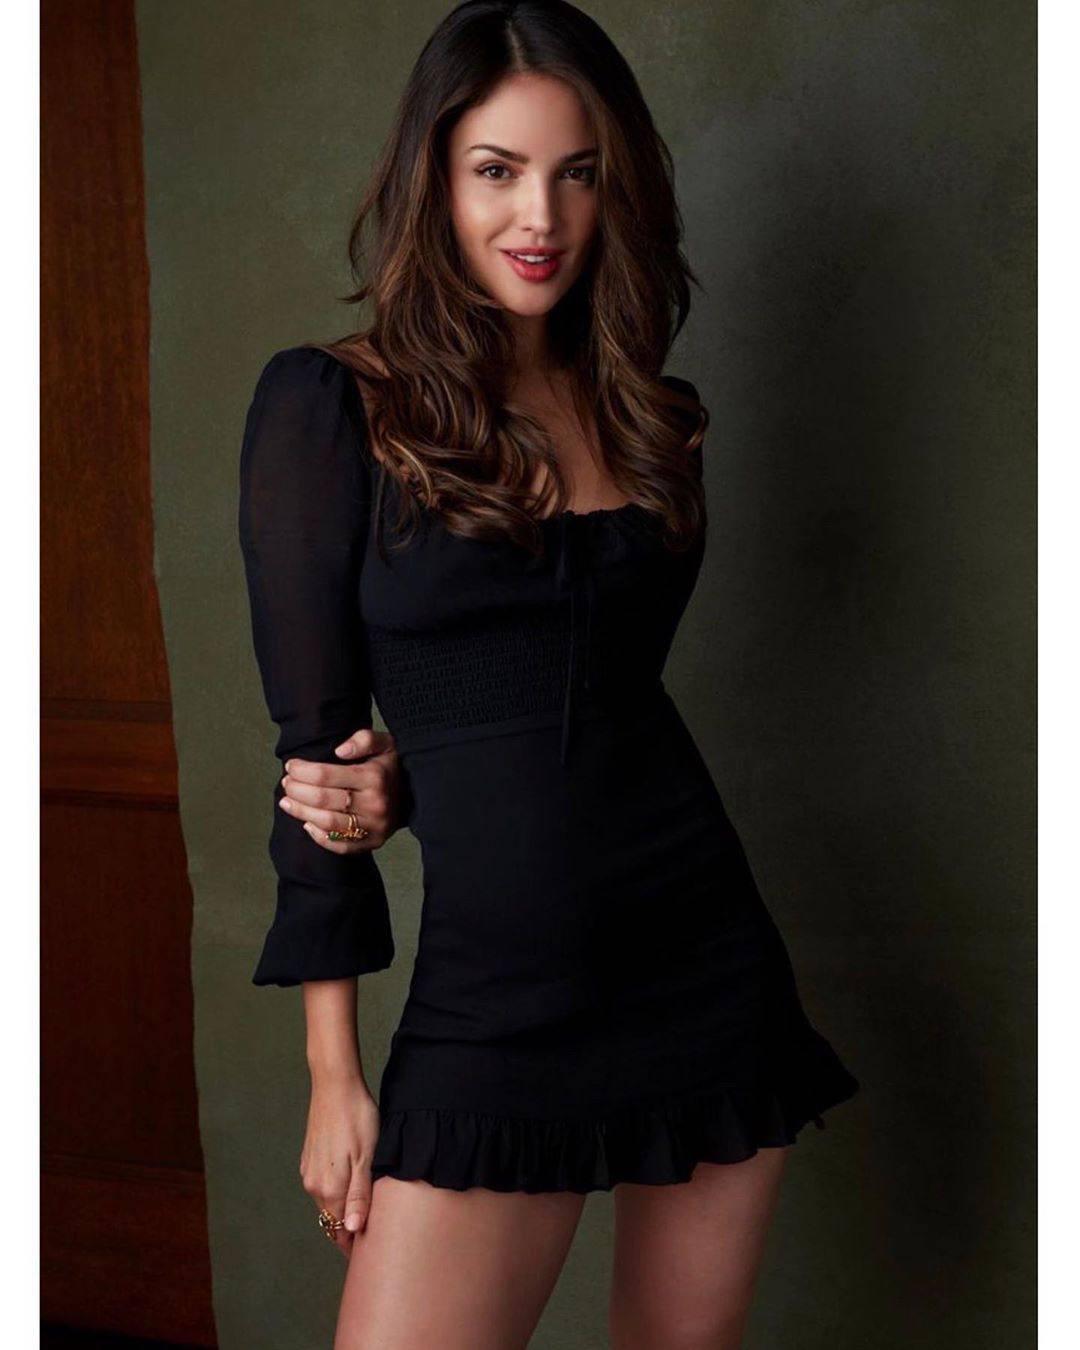 Eiza Gonzalez Beautiful In Black Dress